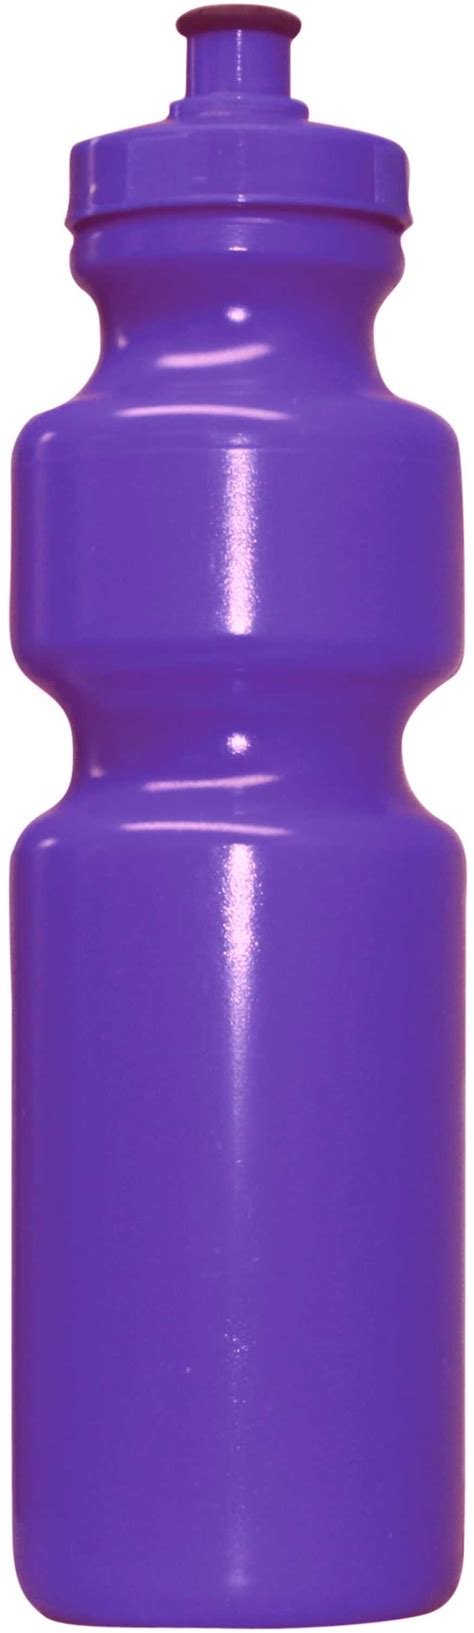 drink bottle 750ml drink bottle thermalmate